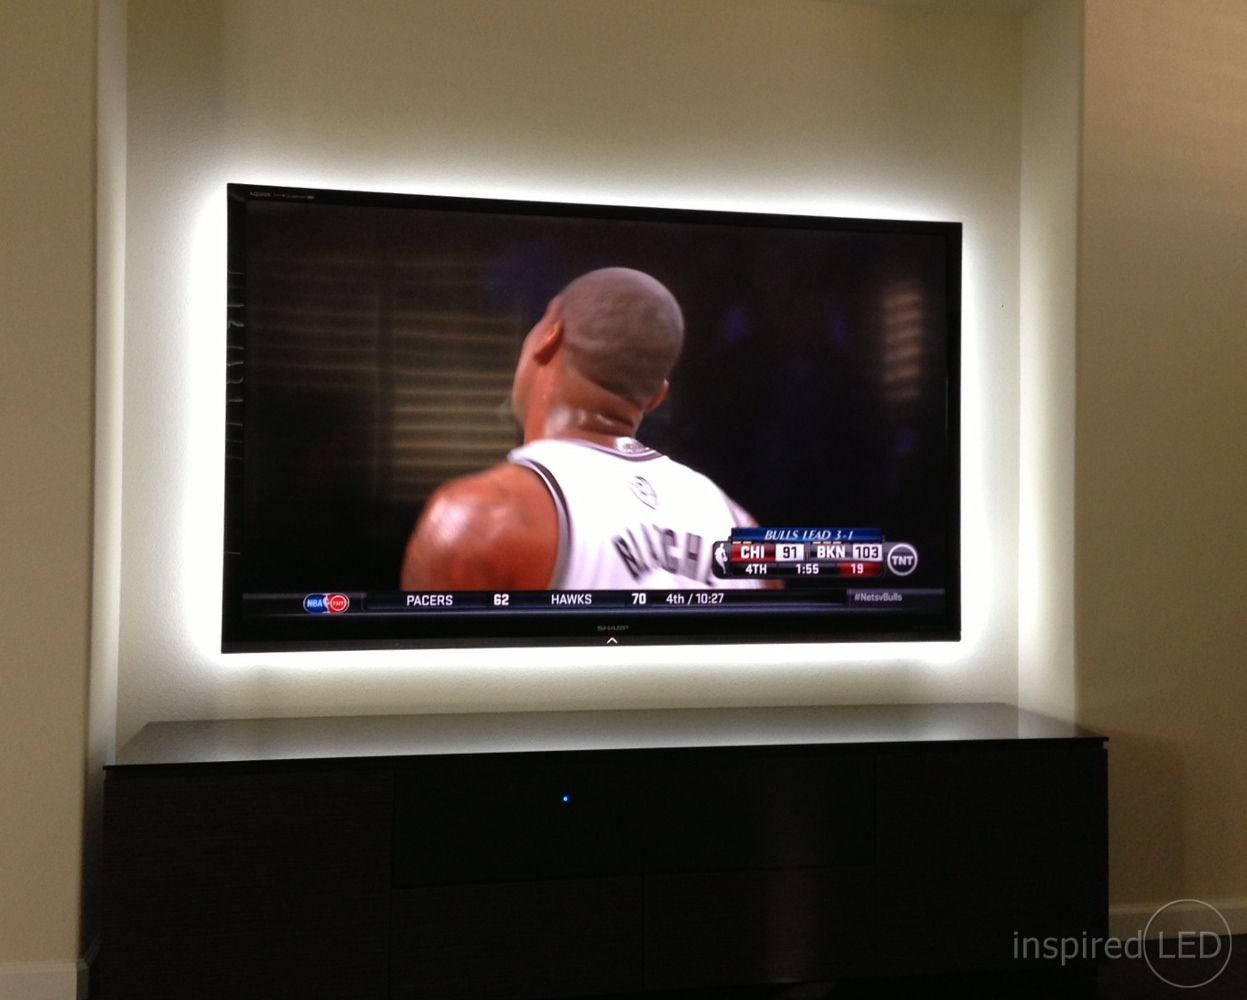 Cool Idea Led Lighting Behind A Tv To Reduce Eye Strain Led Living Room Lights Lights Behind Tv Living Room Lighting